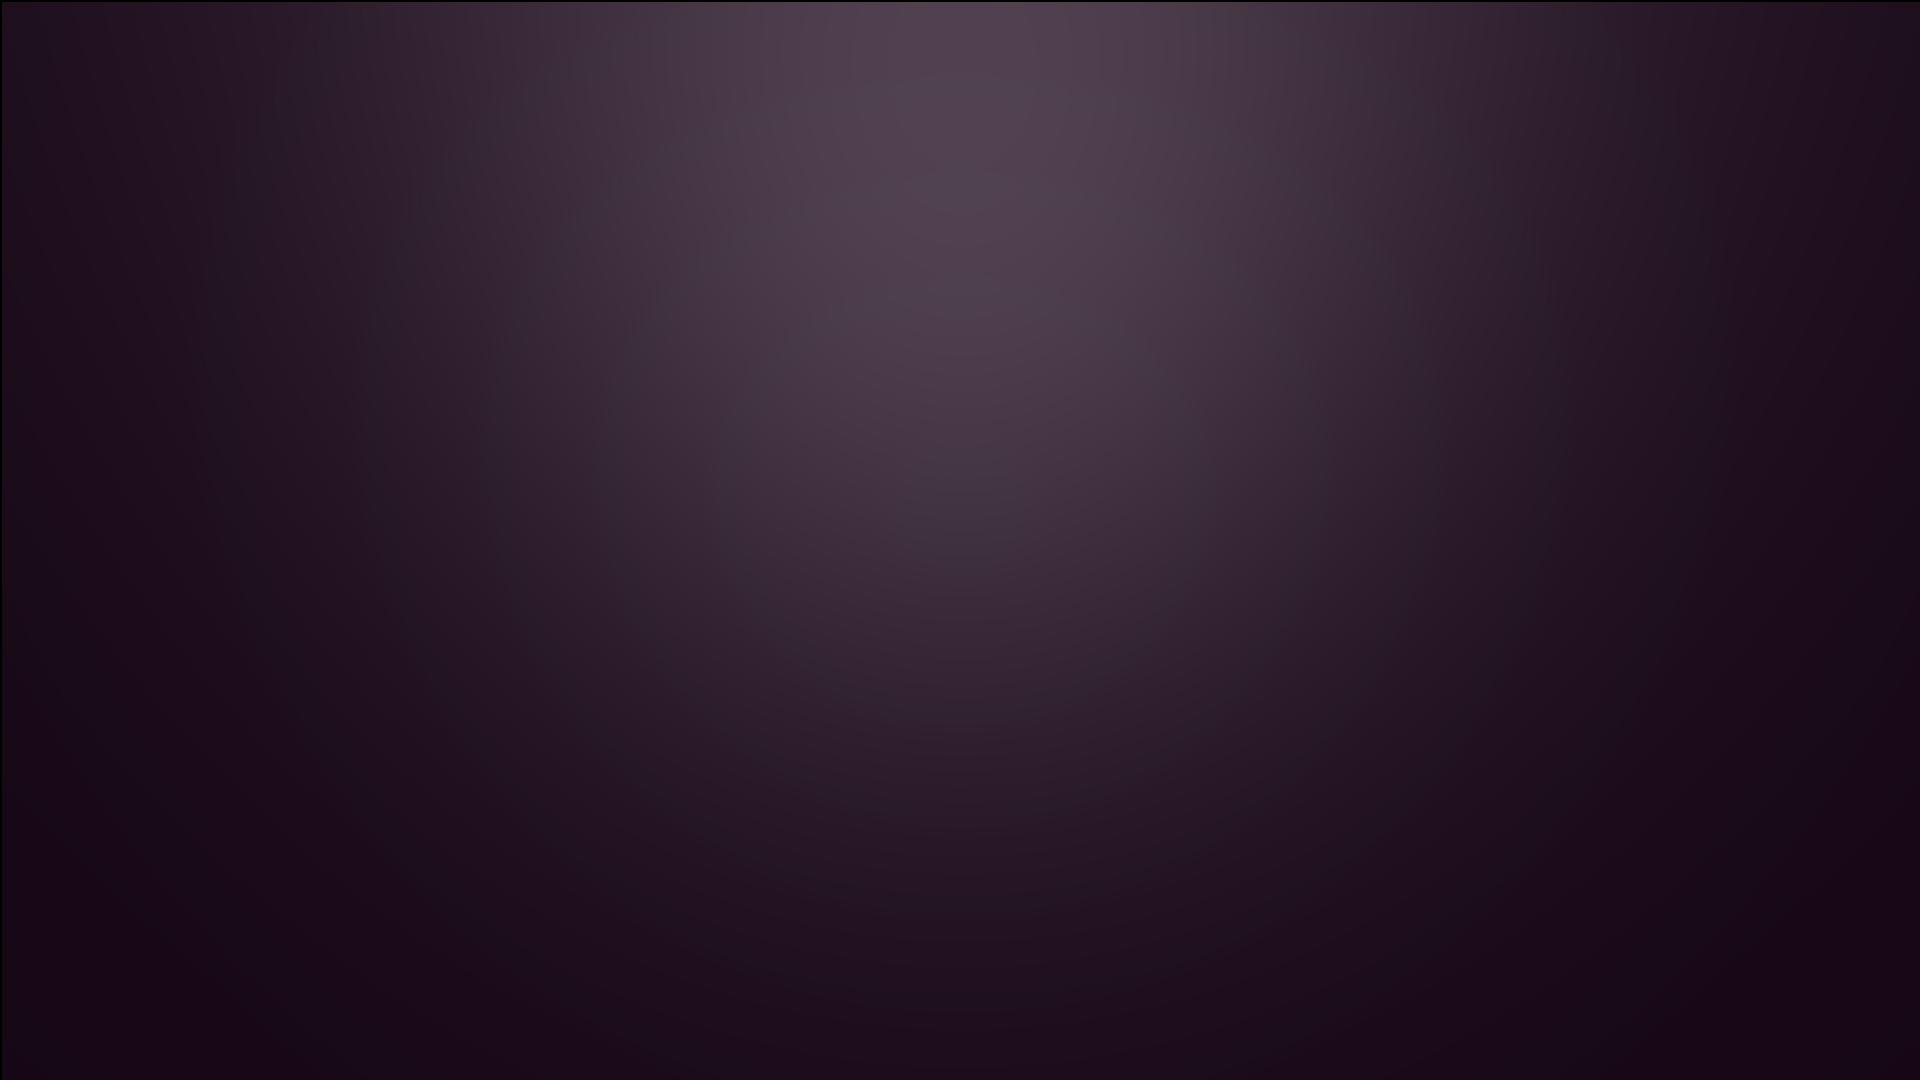 Wallpapers For Plain Dark Purple Wallpaper 1920x1080